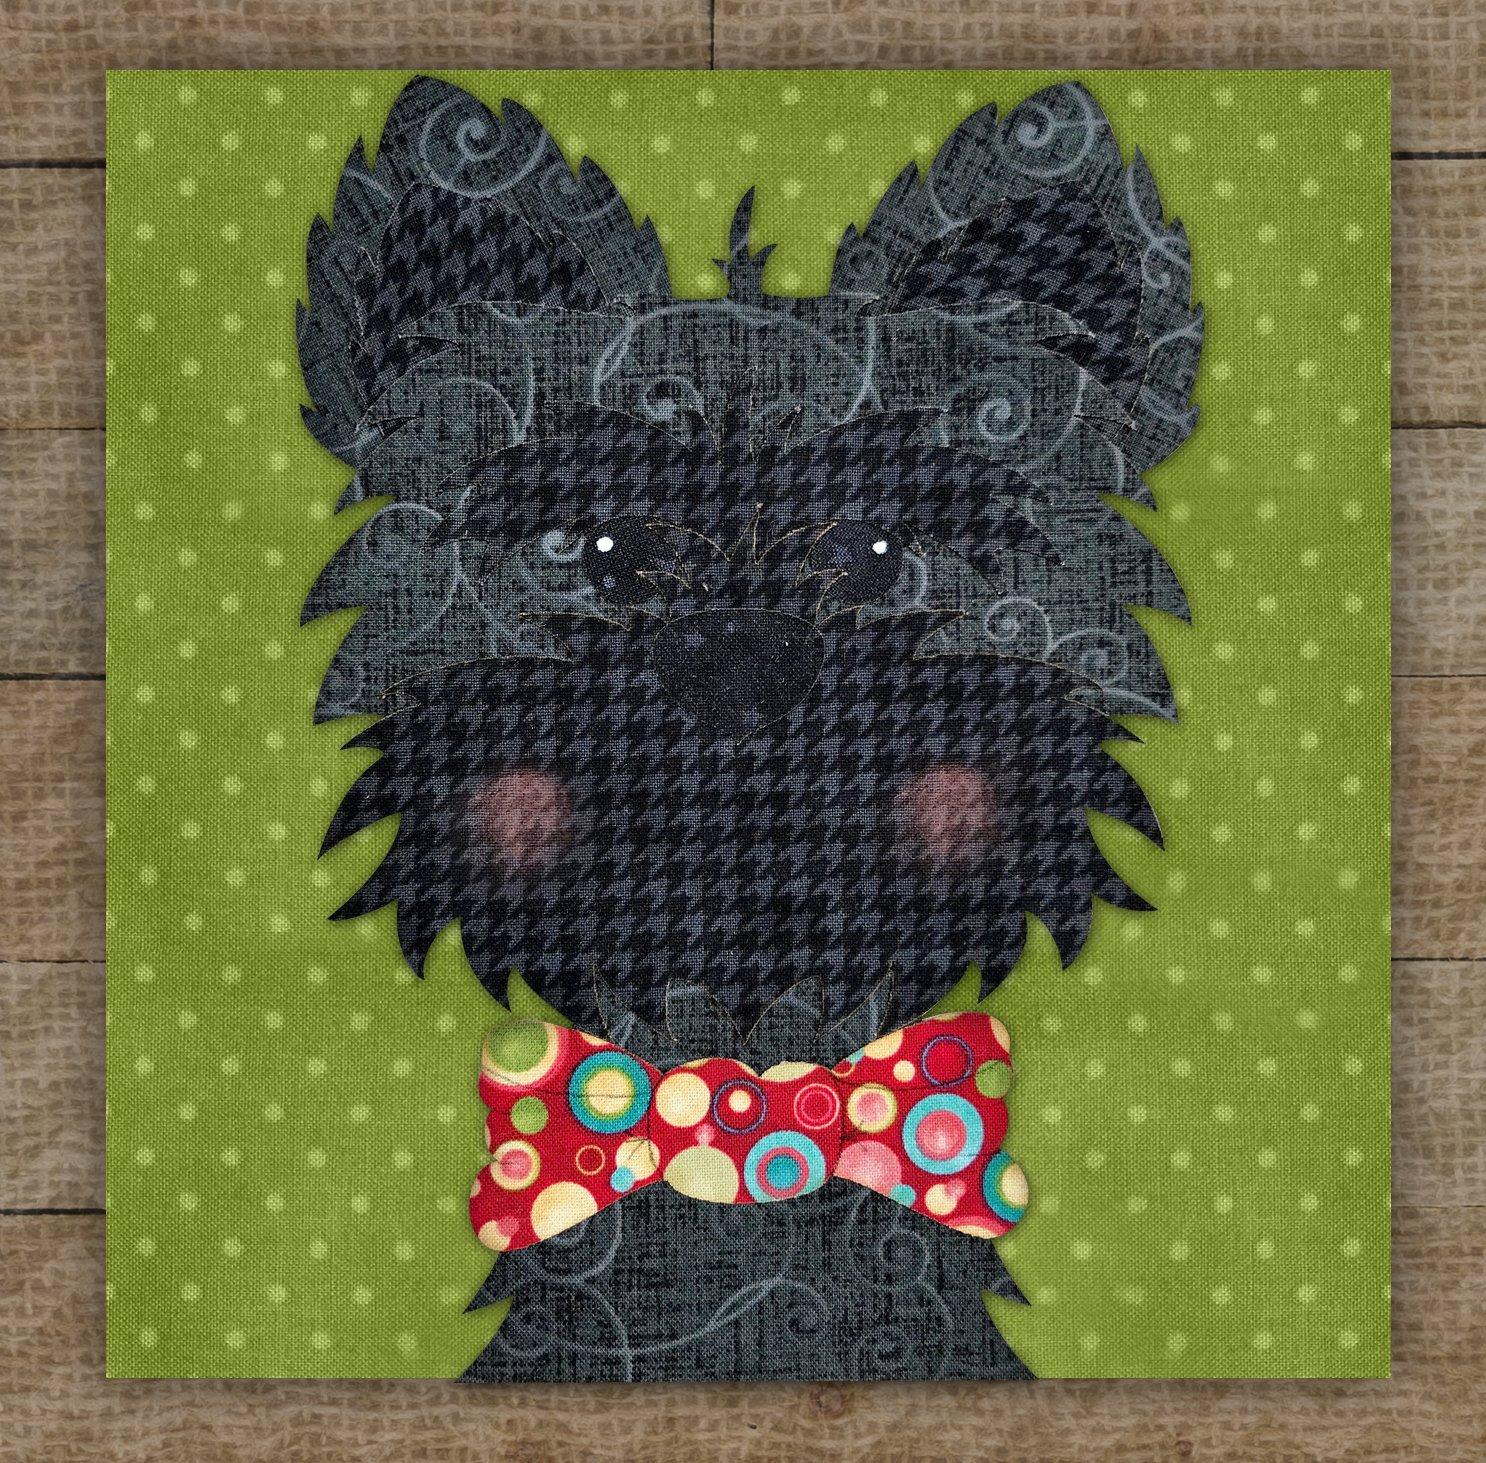 Cairn Terrier (Black) Precut Fused Applique Kit